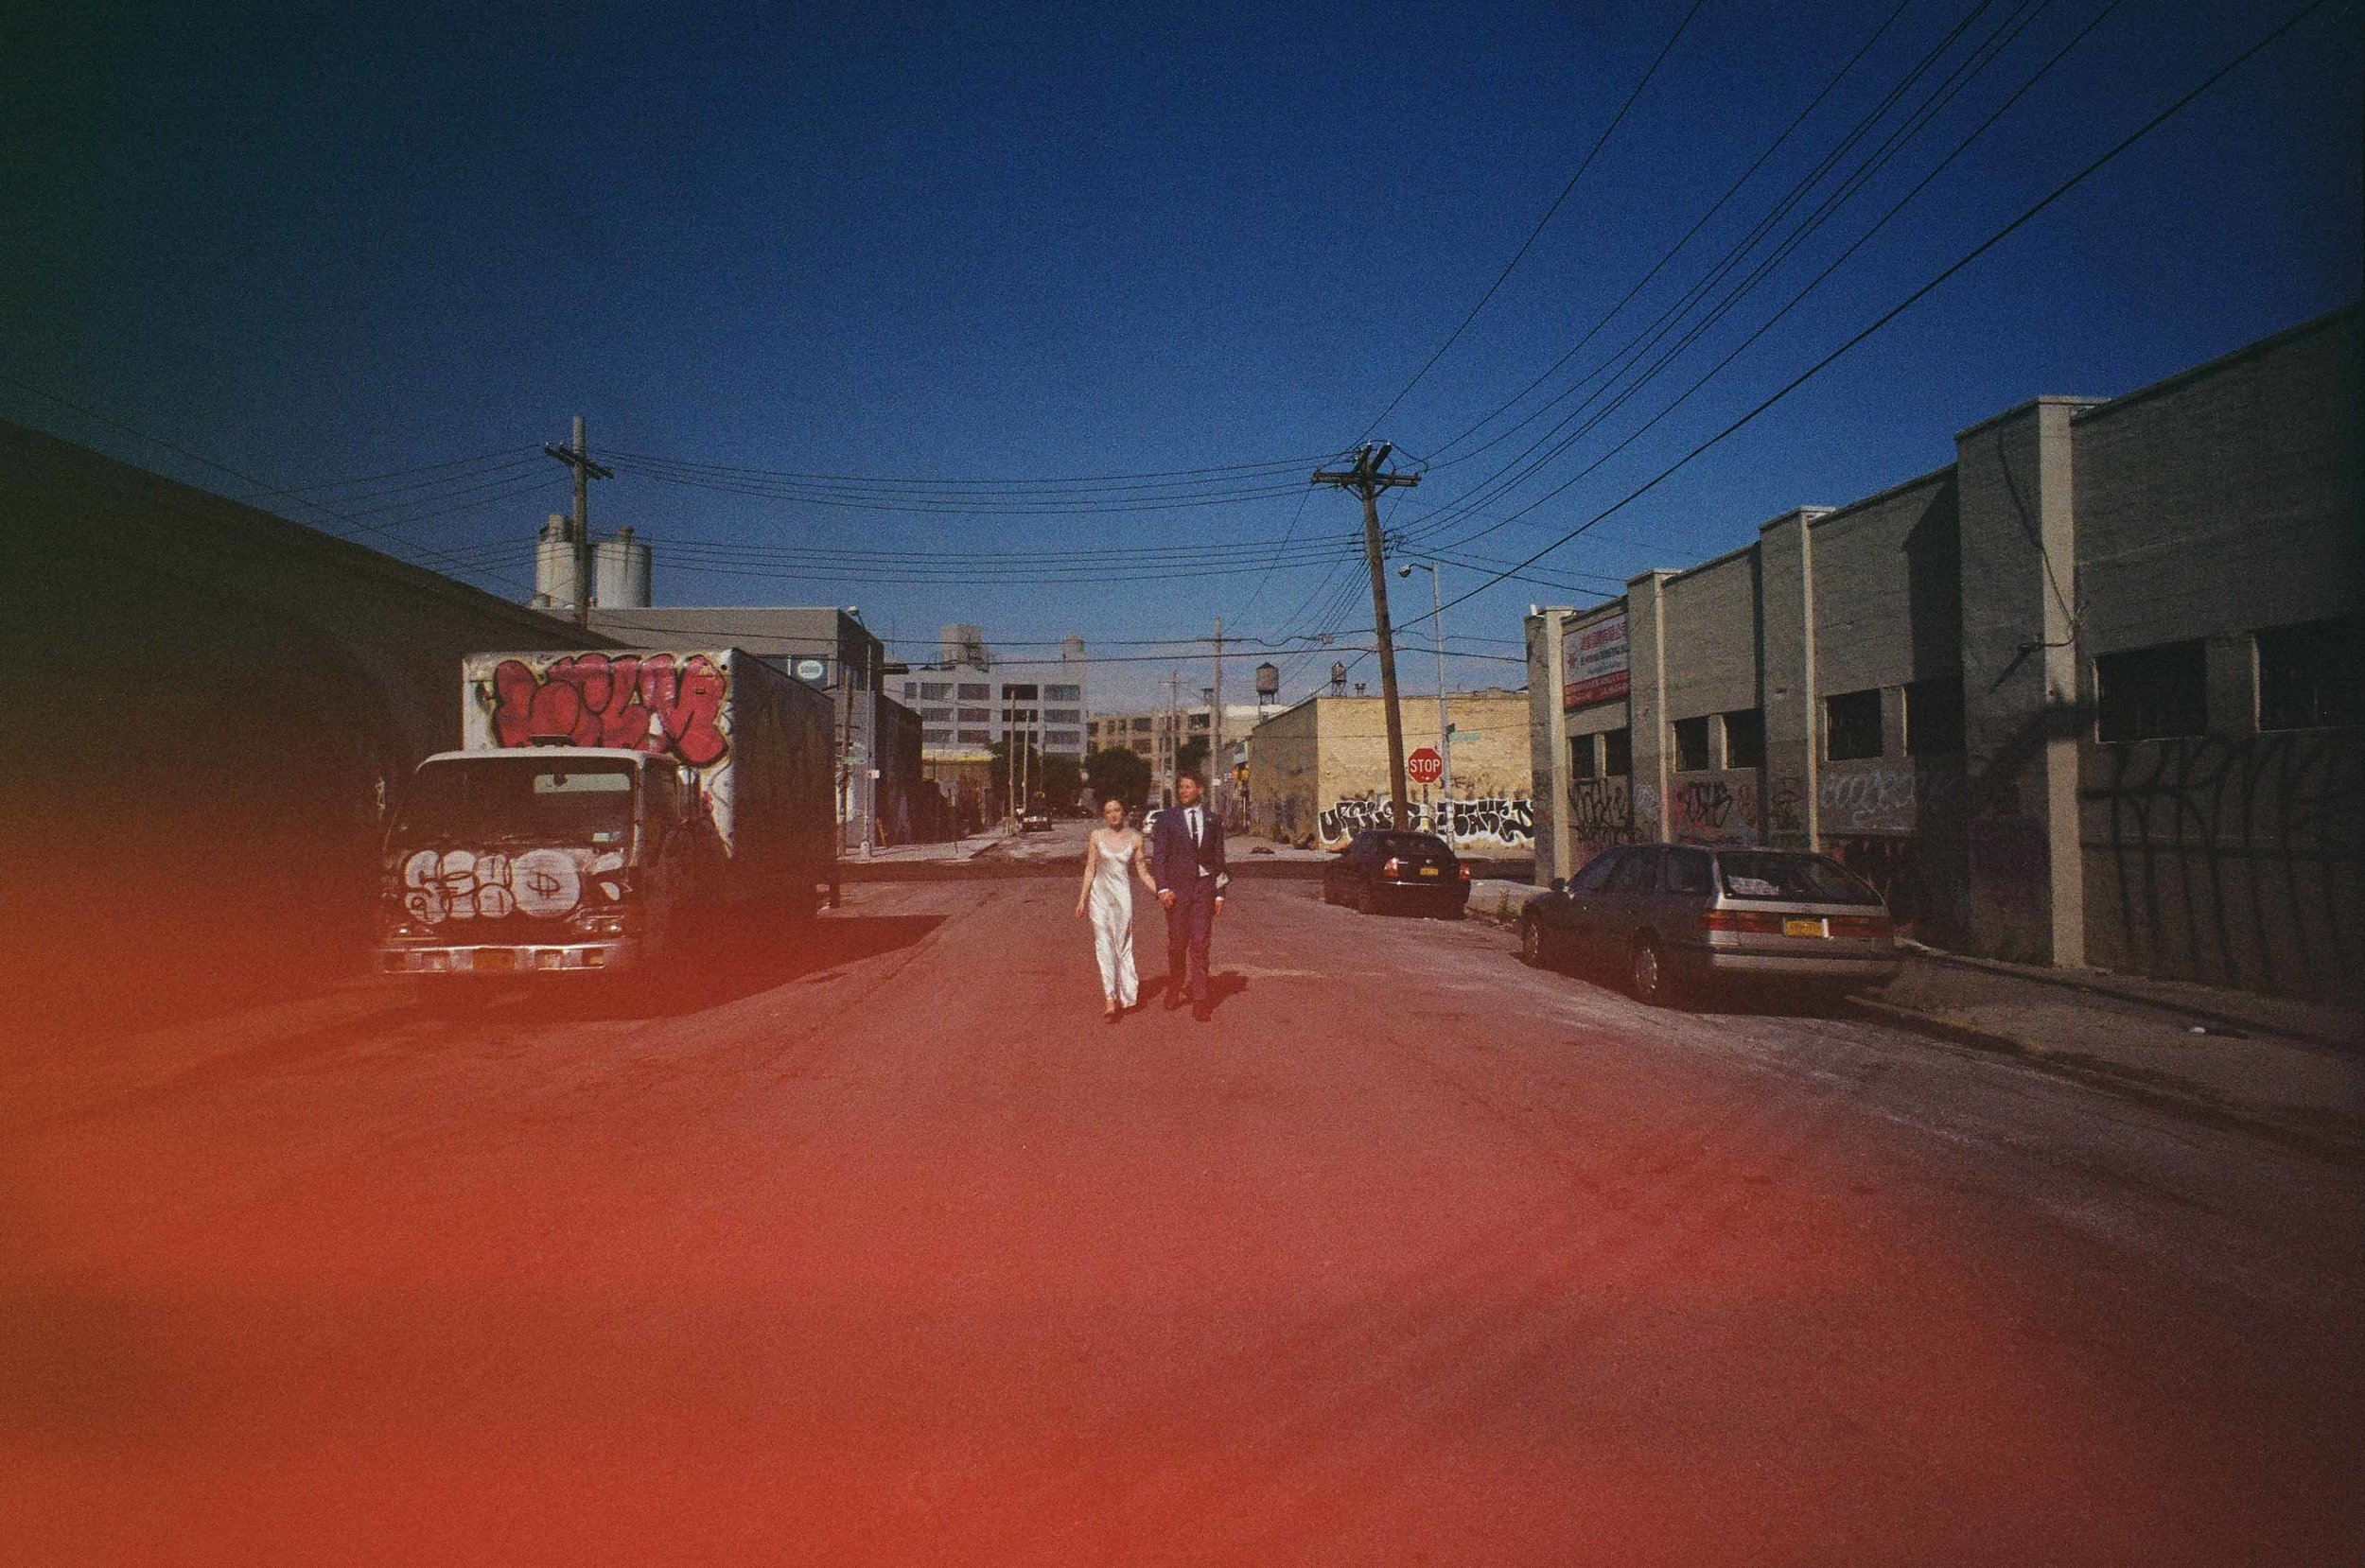 35mm_Film_Wedding_Photographer_Chellise_Michael_Photography-15.jpg